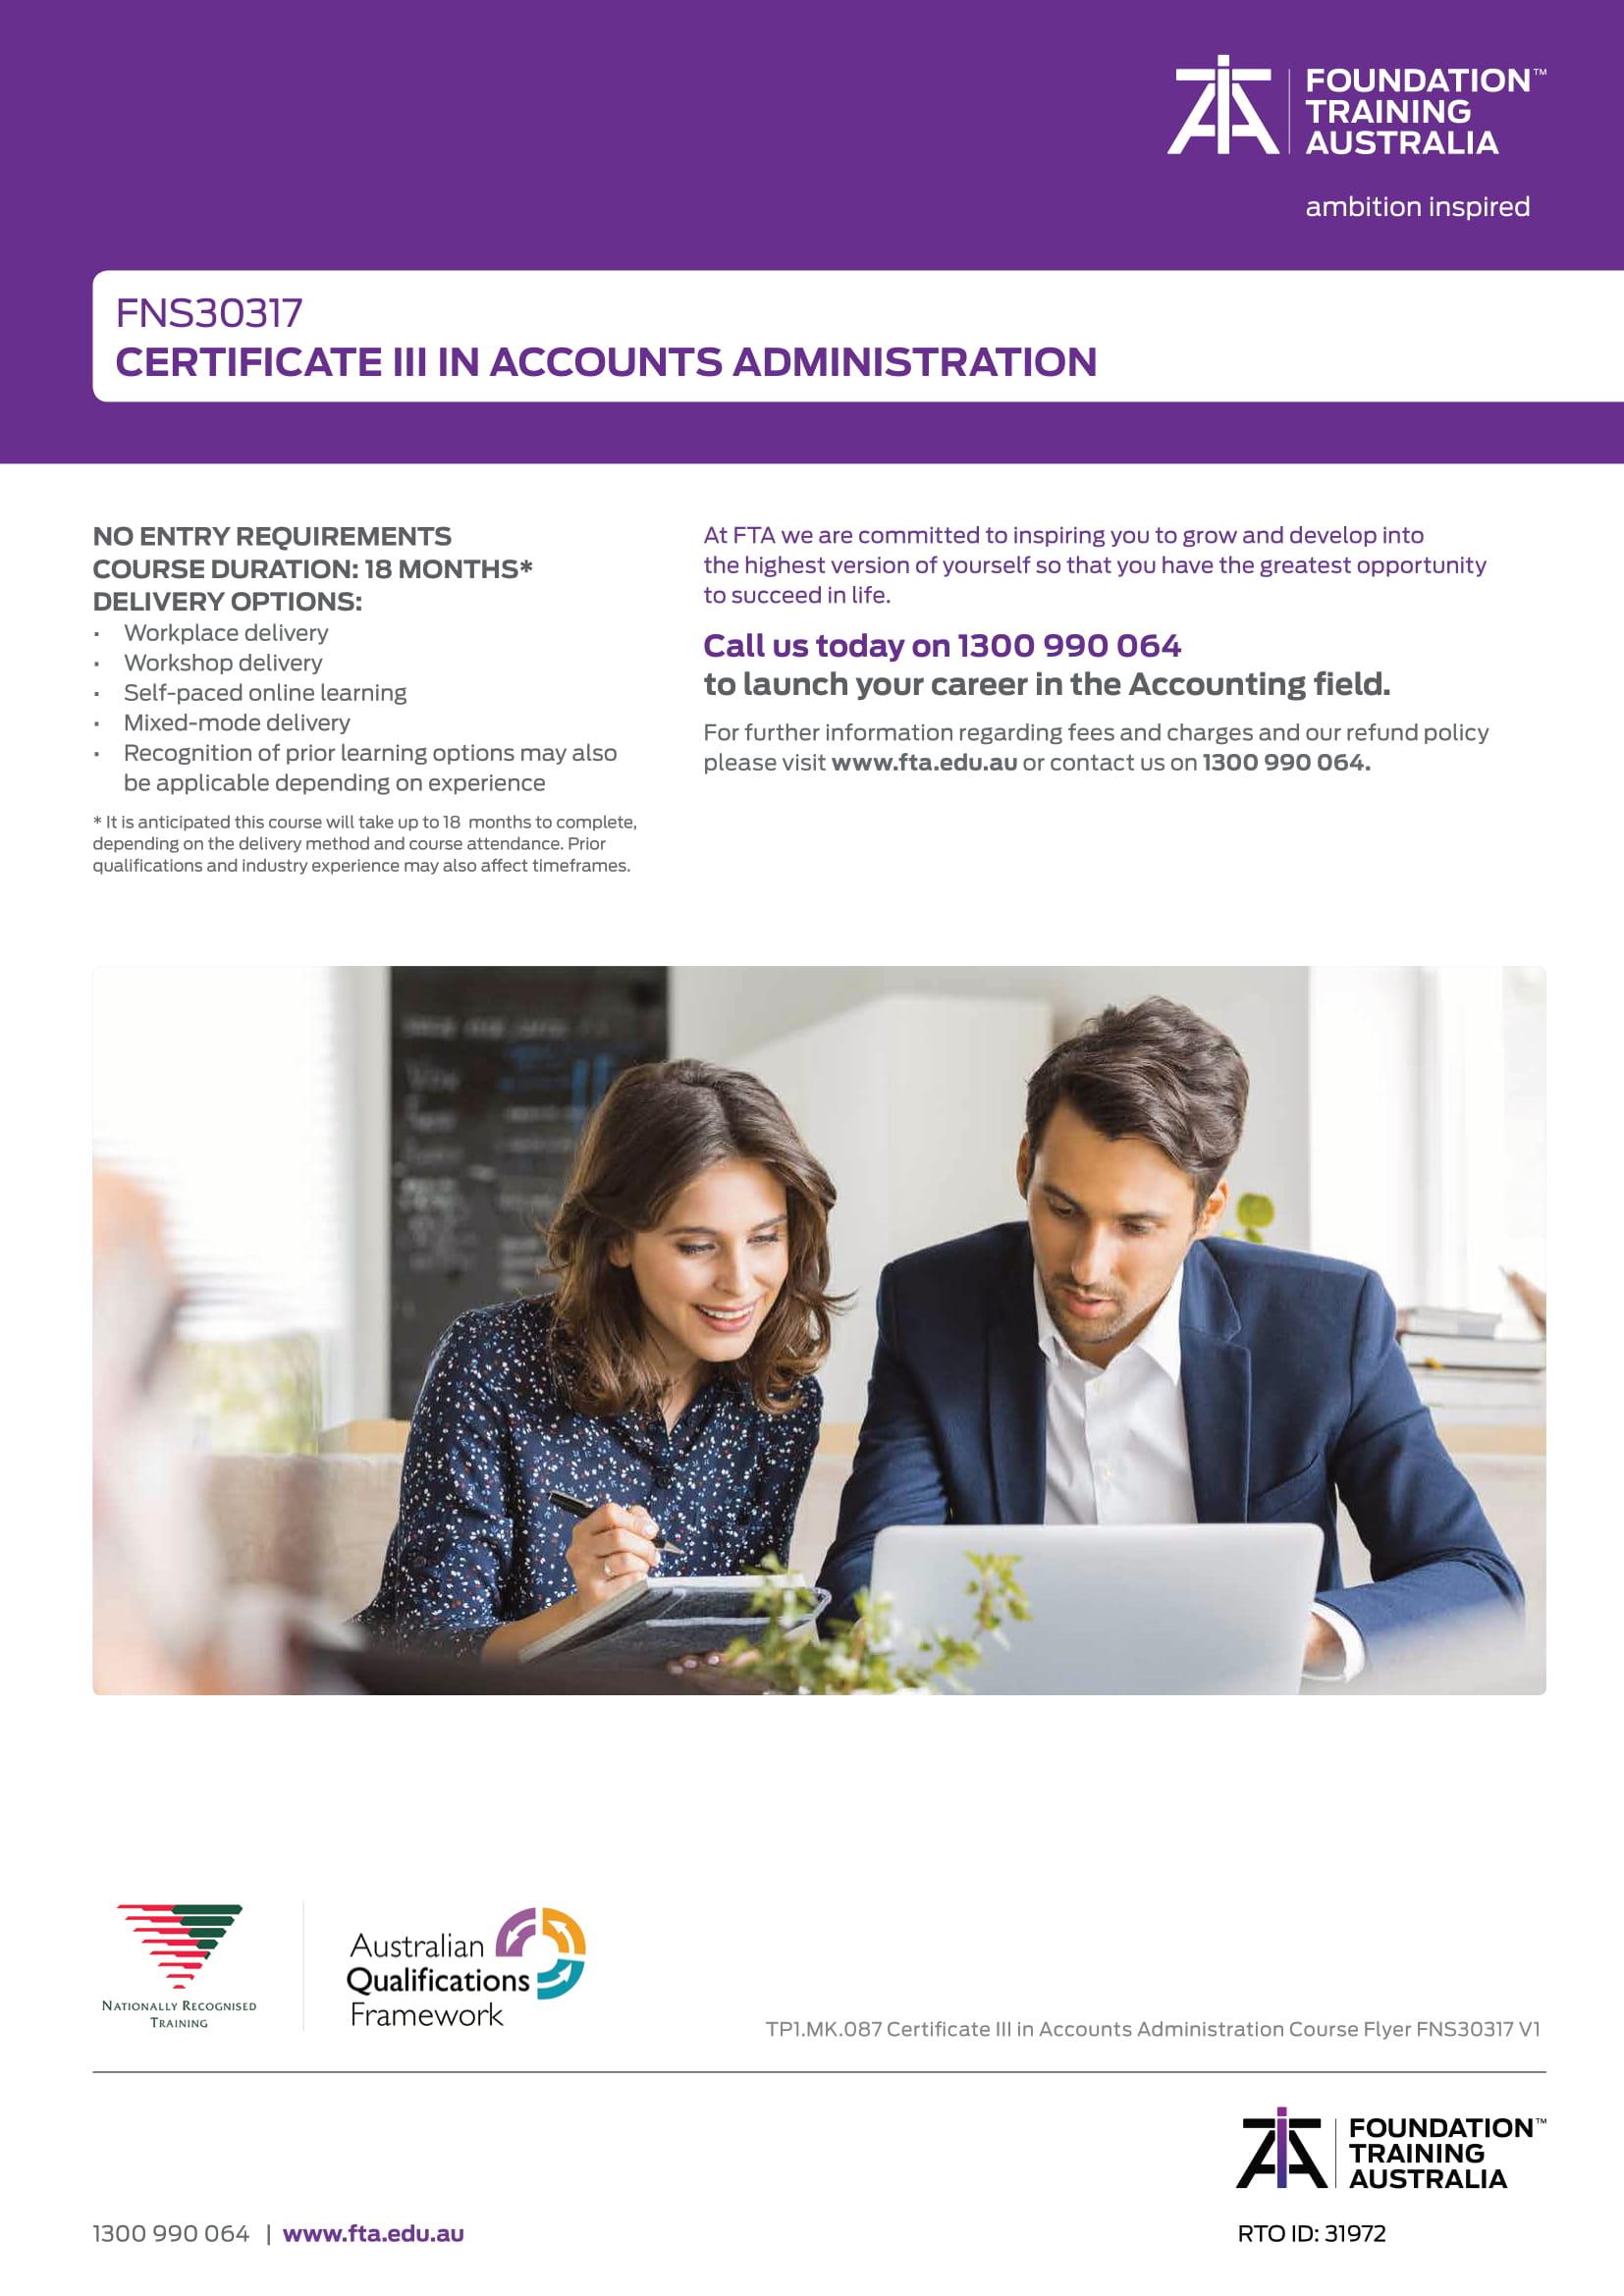 https://www.fta.edu.au/wp-content/uploads/2020/06/TP1.MK_.087-Certificate-III-in-Accounts-Administration-Course-Flyer-FNS30317-V1-DIGITAL-2.jpg